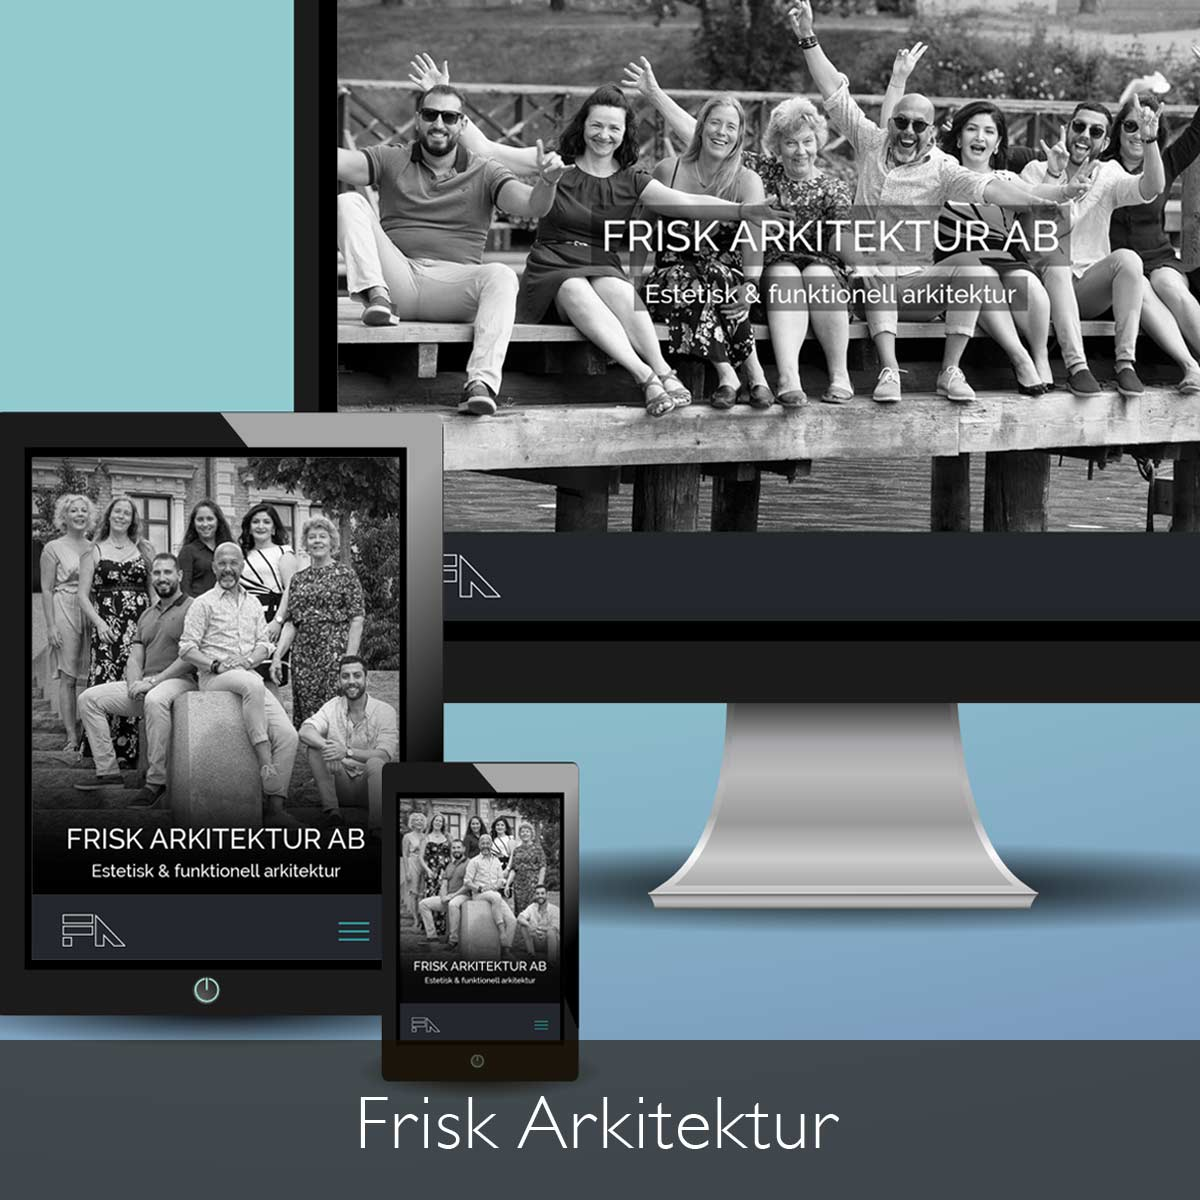 frisk-arkitektur-produktbild-1200x1200